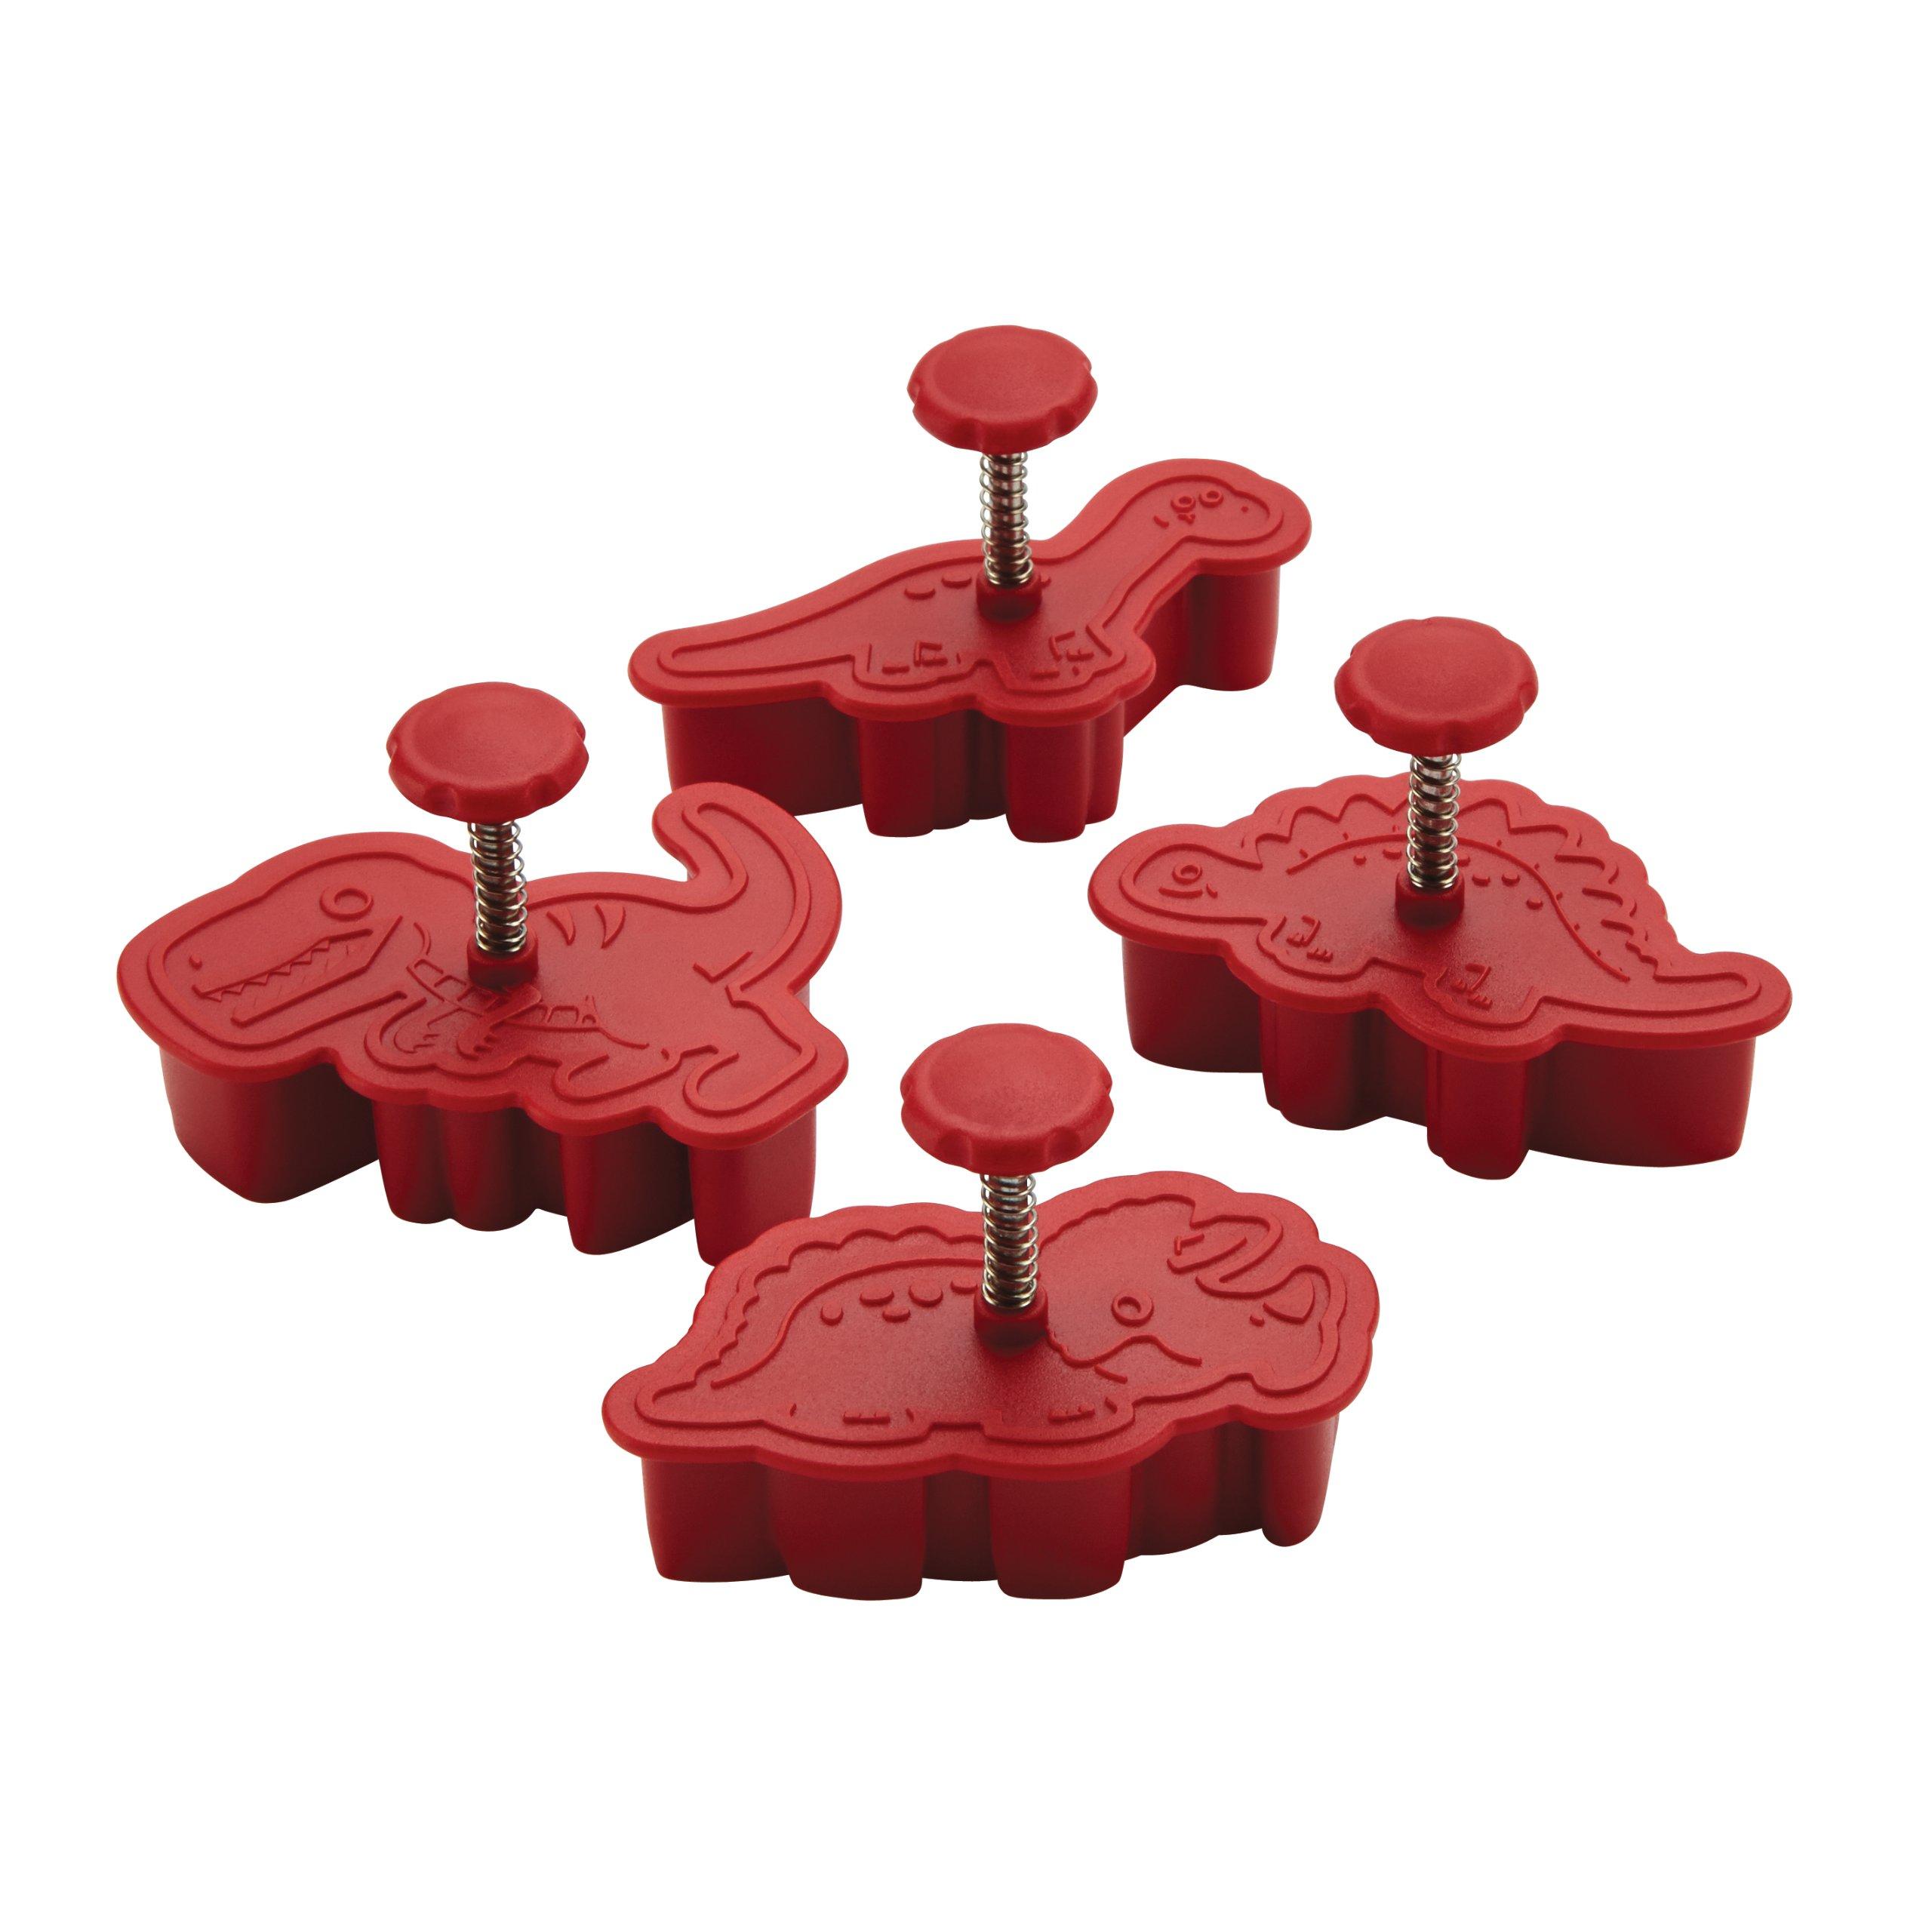 Cake Boss Decorating Tools 4-Piece Dinosaur Fondant Press Set, Red